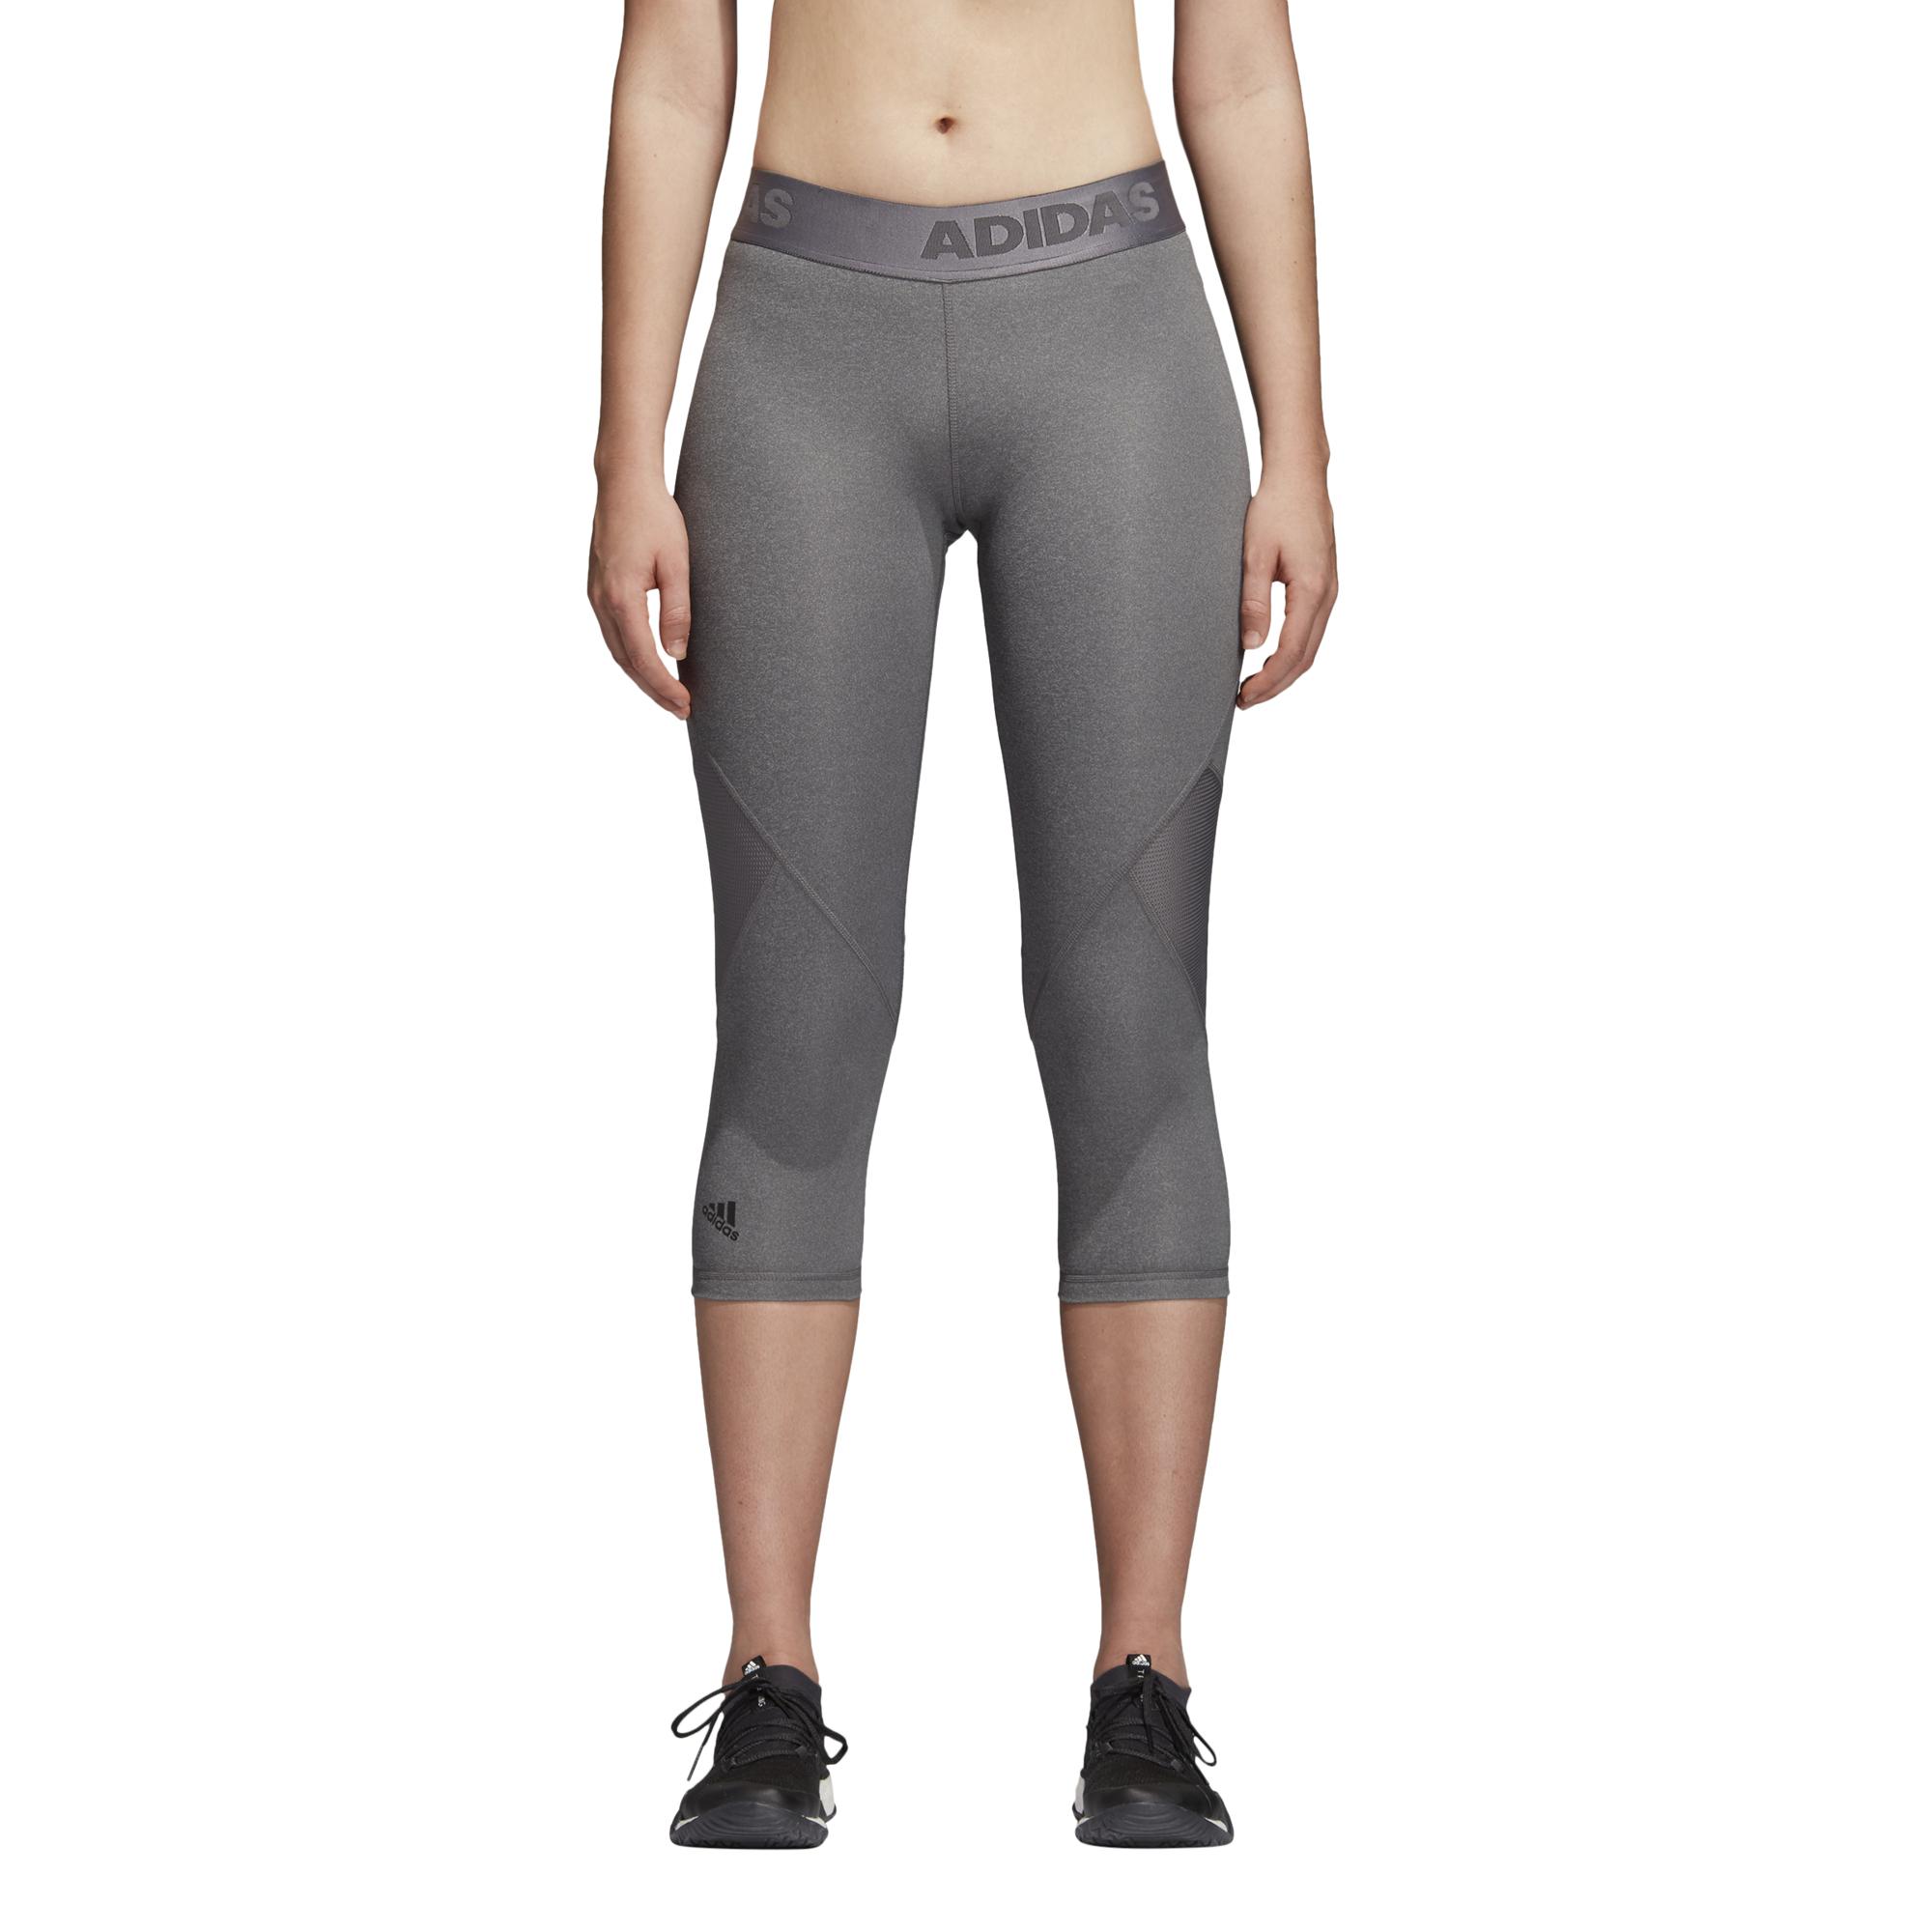 adidas Alphaskin Sport Heather 3/4-Tight Damen